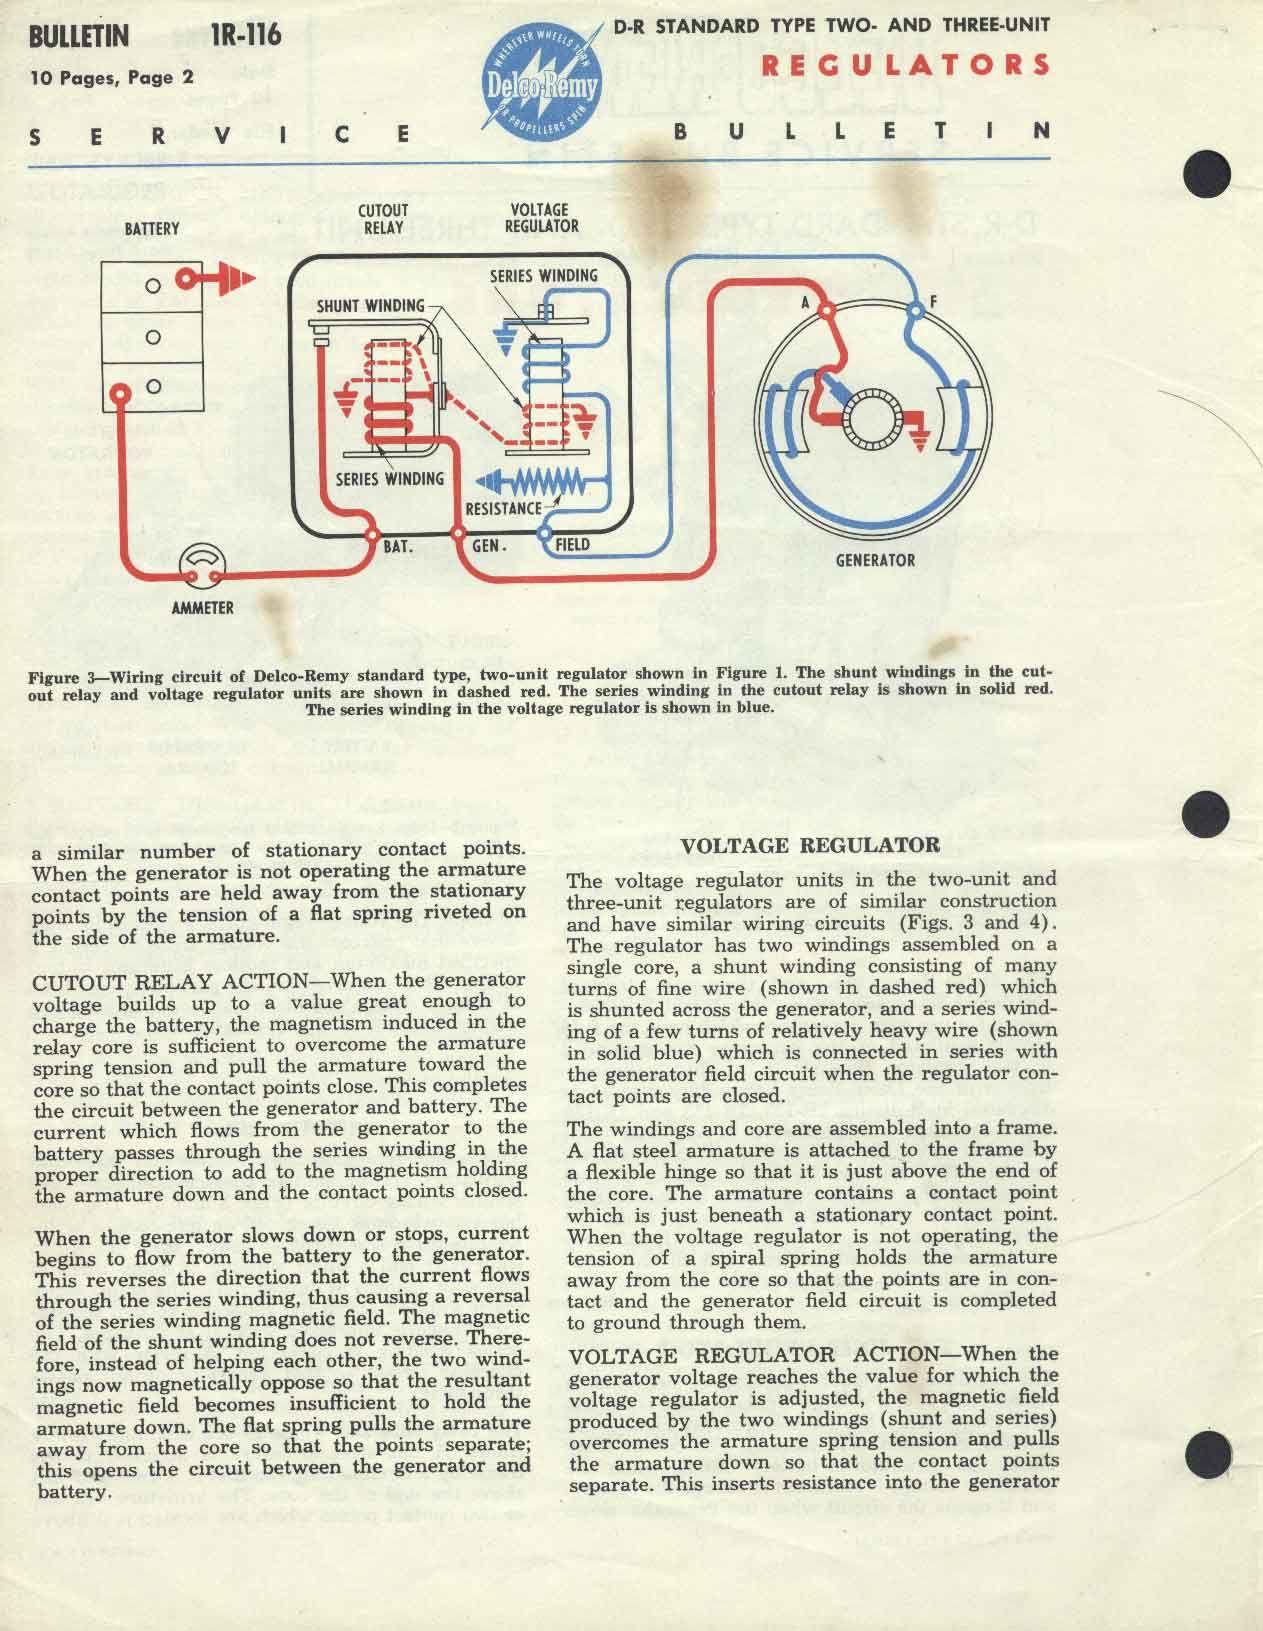 [SCHEMATICS_48DE]  Delco-Remy Bulletin No. 1R-116 Standard type two- and three unit regulators   Delco Remy 1101355 Wiring Diagram      Panhead and Flathead site